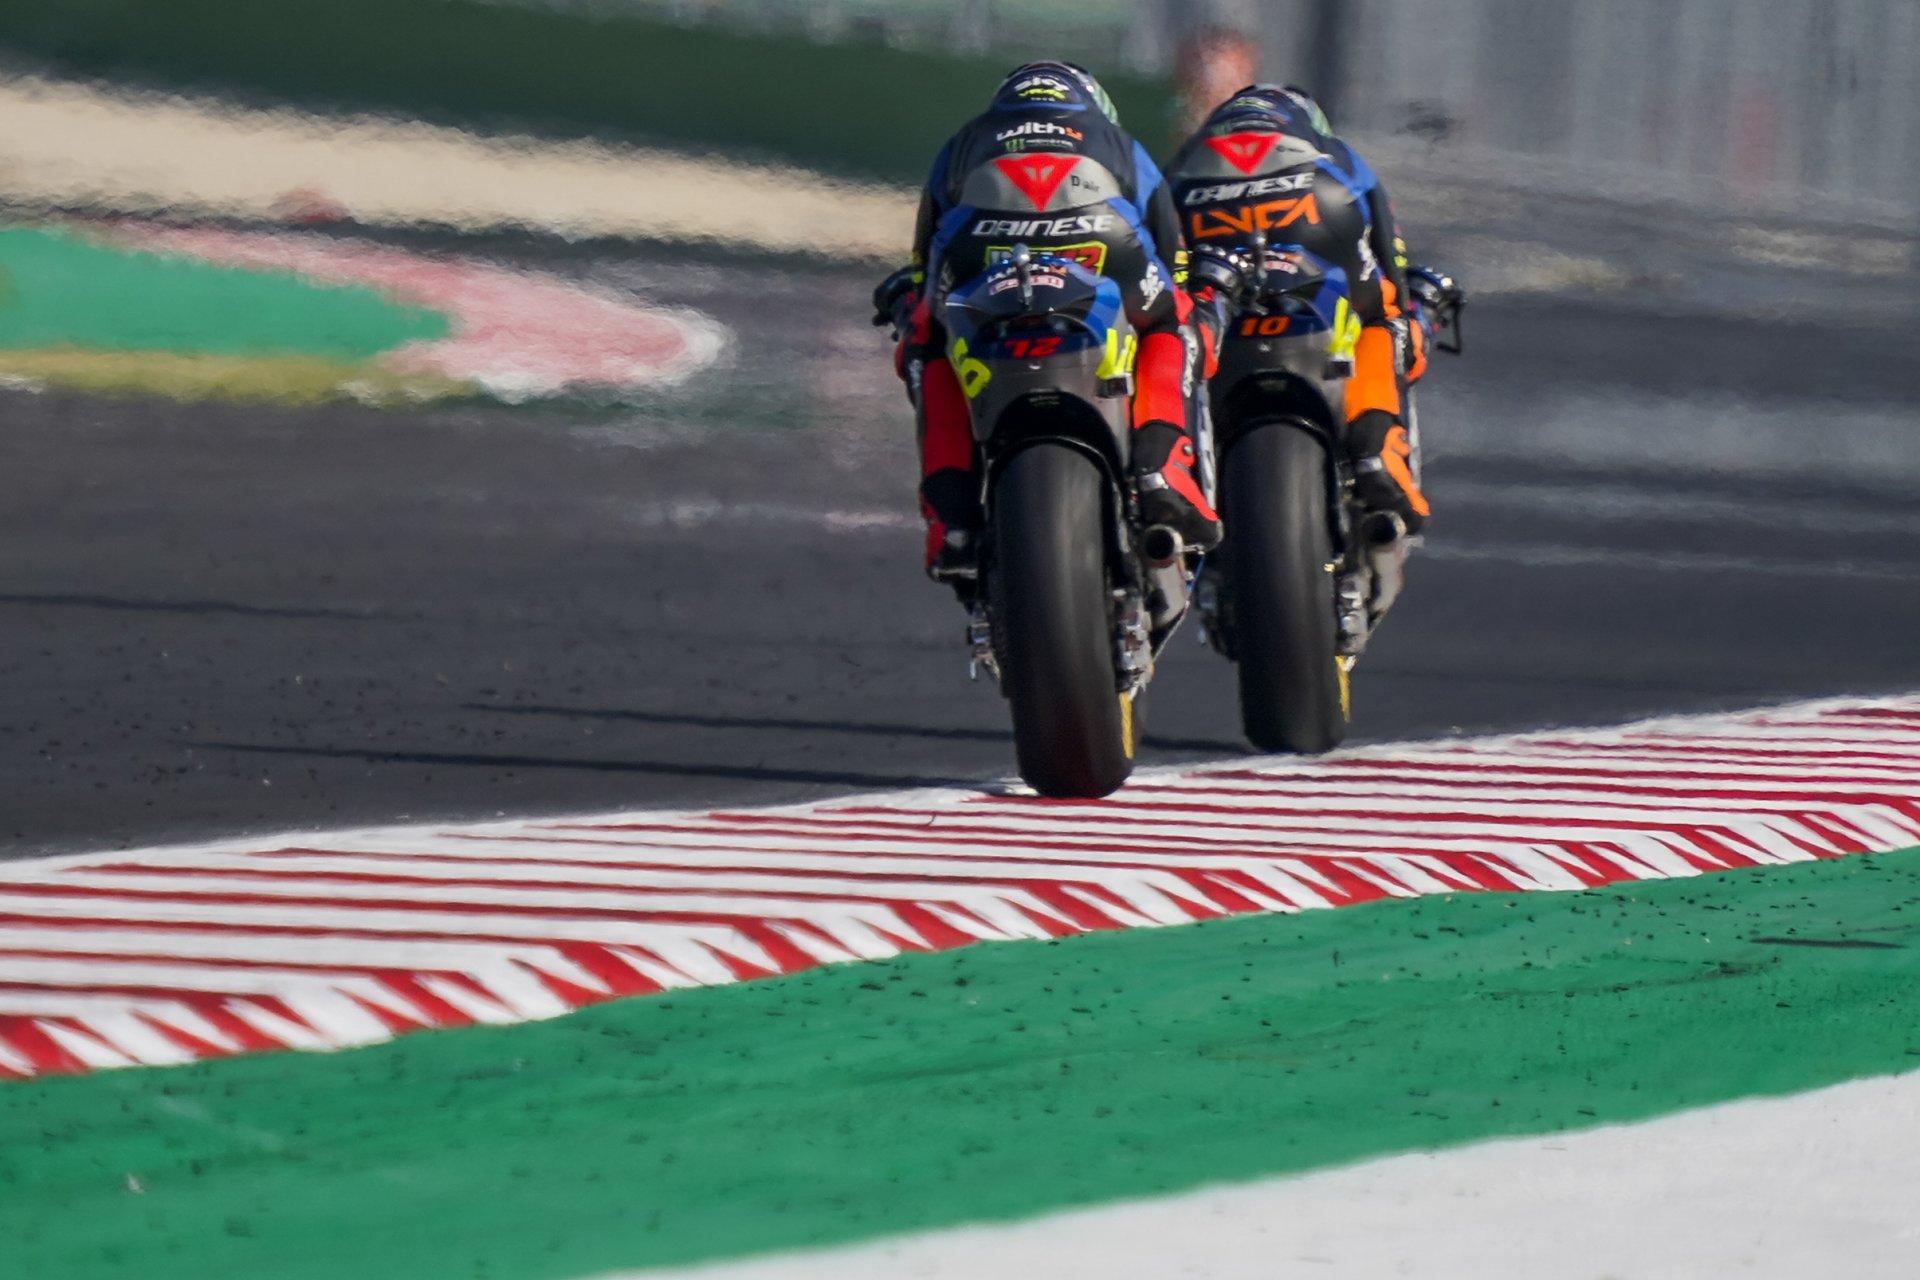 MotoGP Romagna 2020, Qualifiche - Diretta Misano Sky Sport, DAZN, TV8